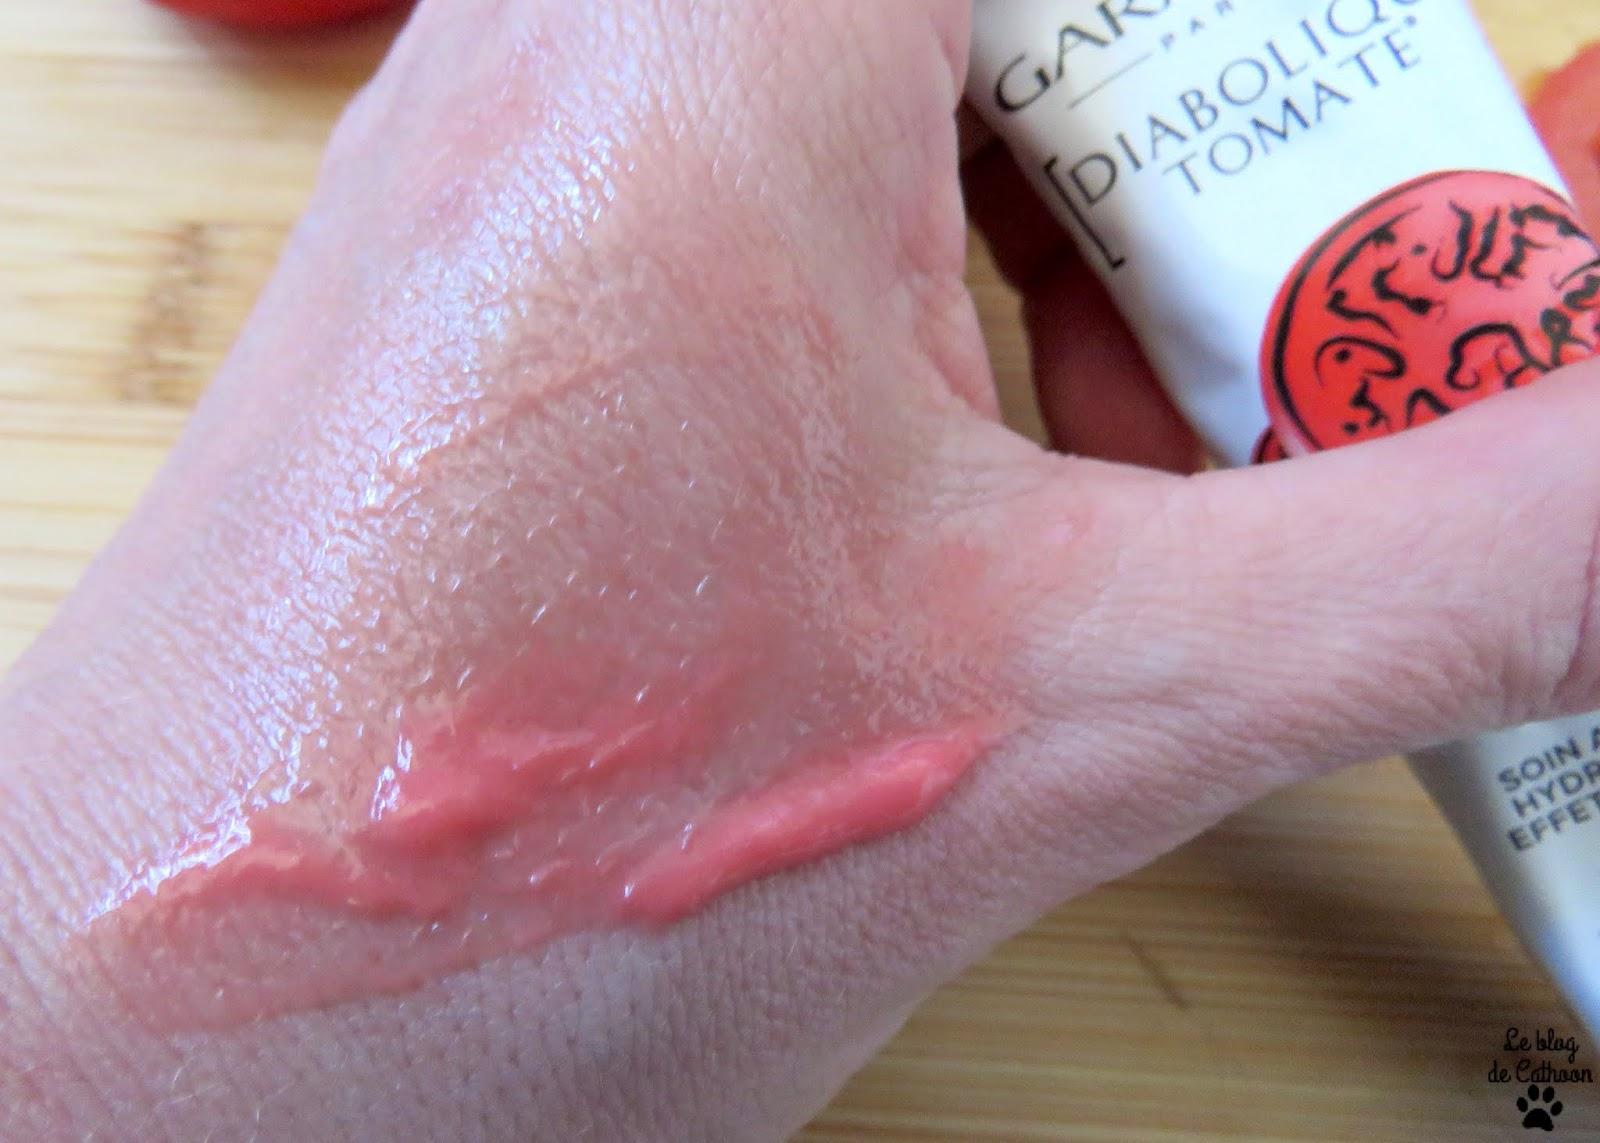 Diabolique Tomate - Crème d'Eau - Garancia